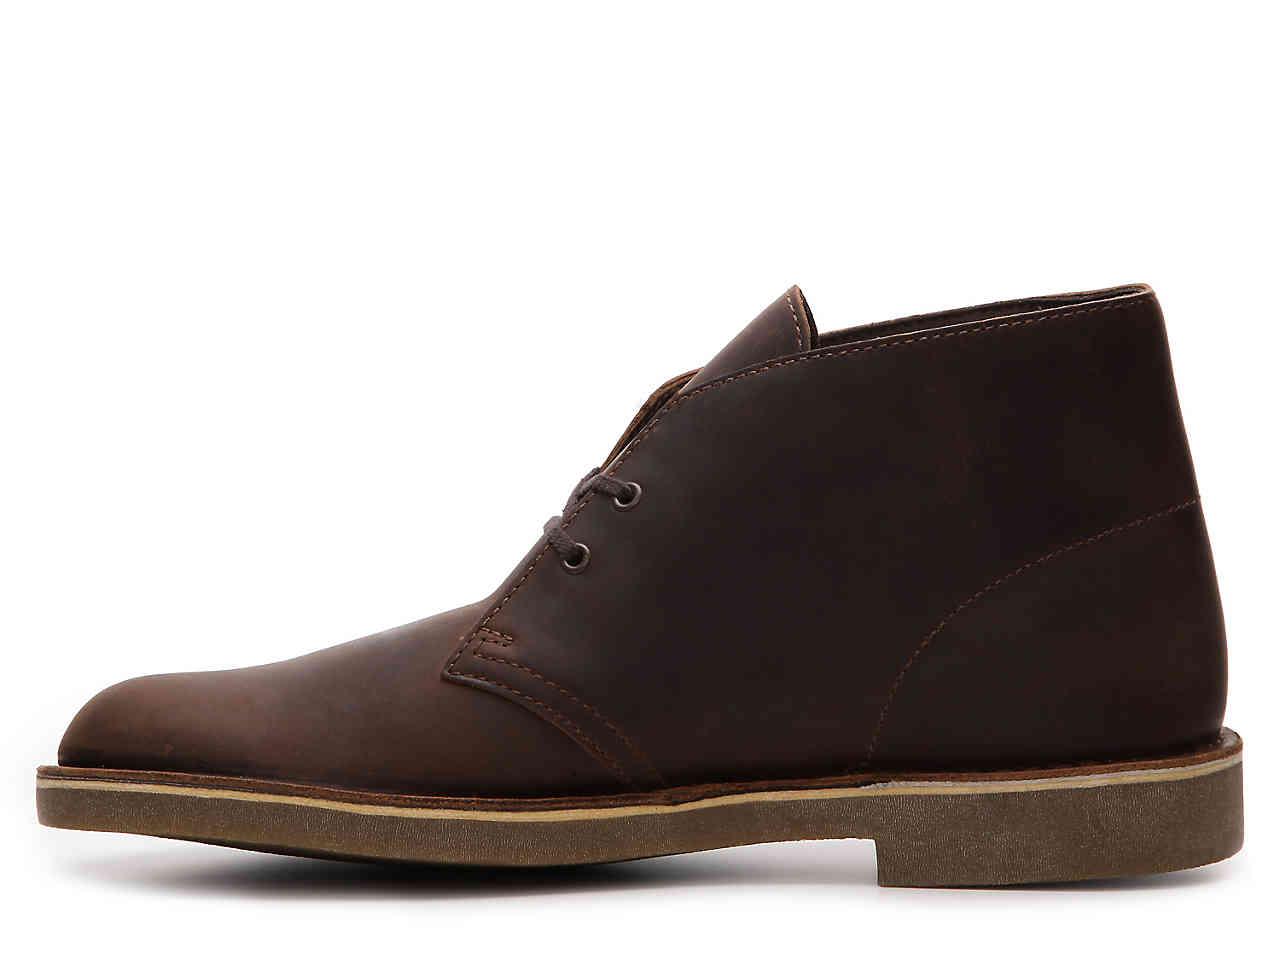 Clarks desert boots on sale